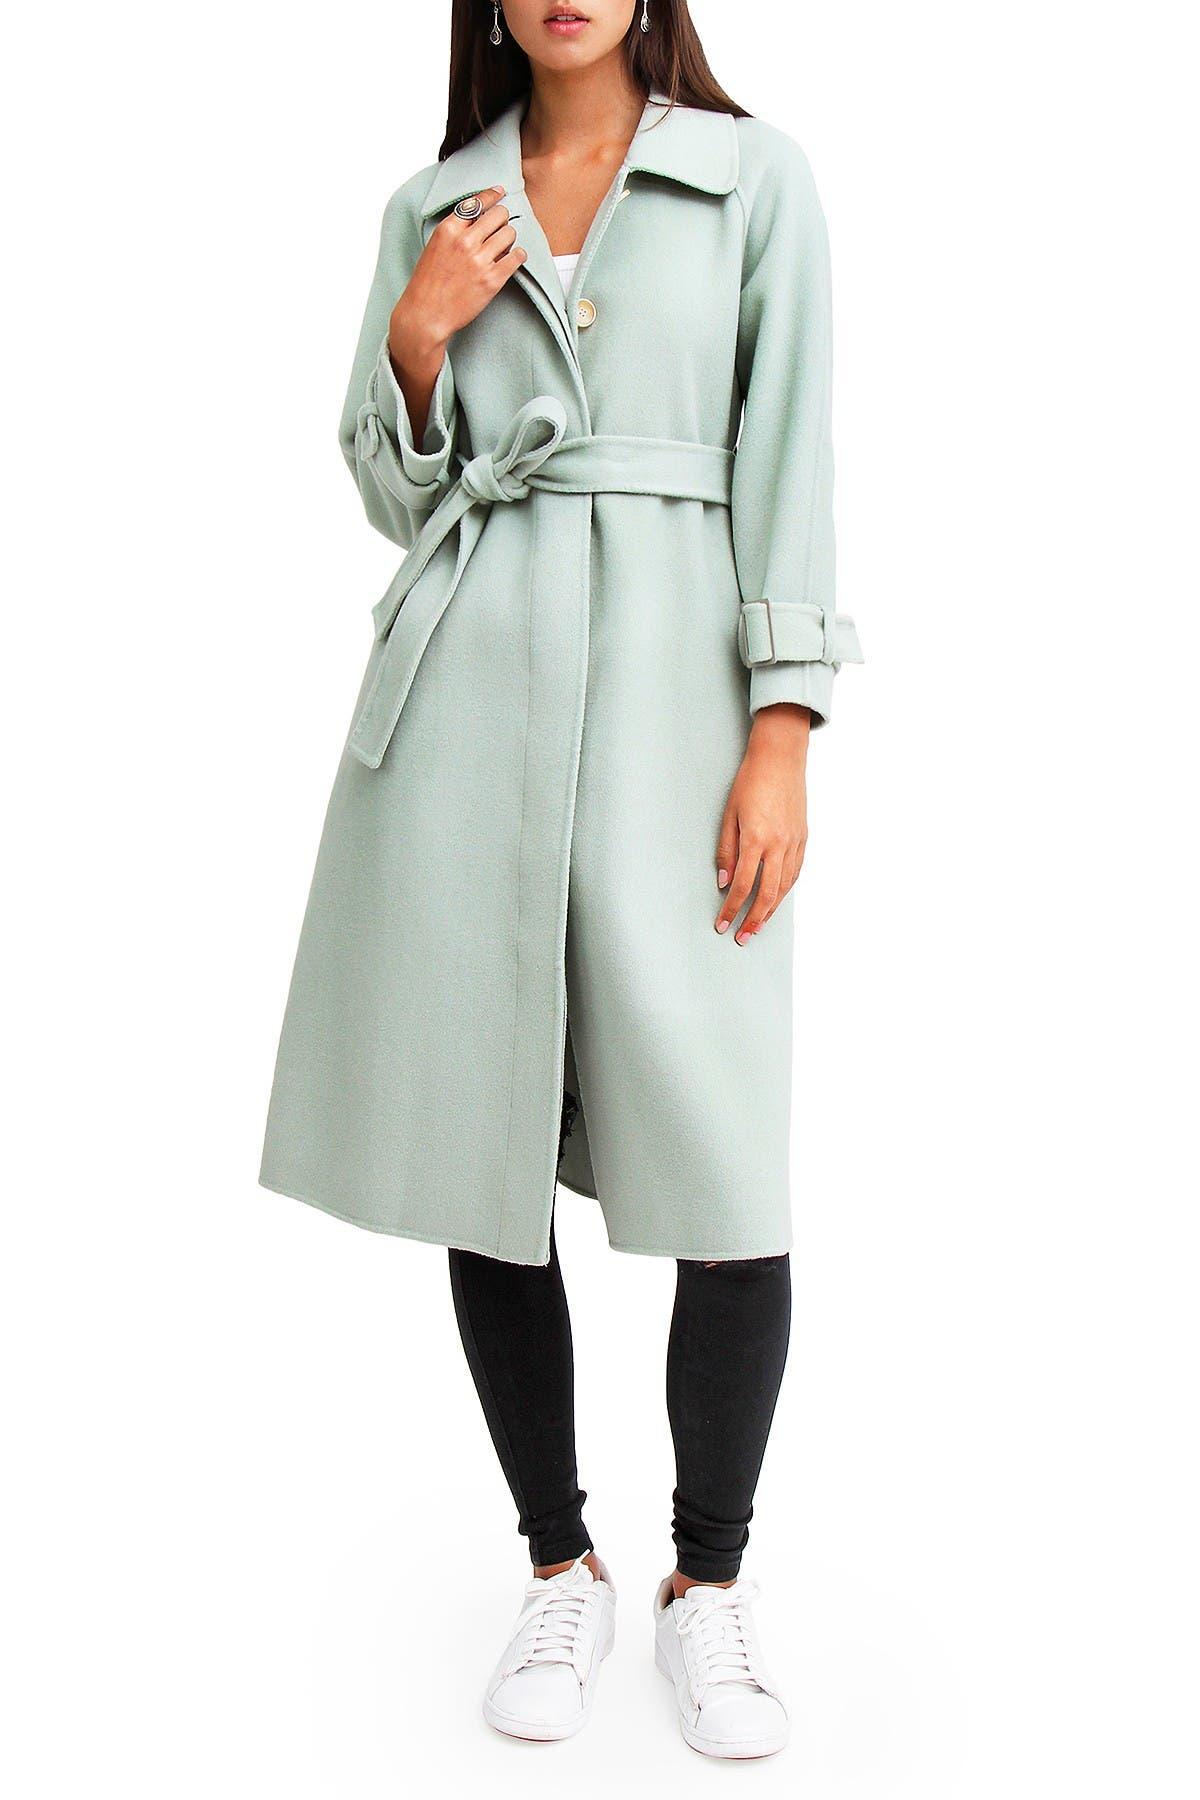 Image of Belle & Bloom Shore To Shore Wool Coat